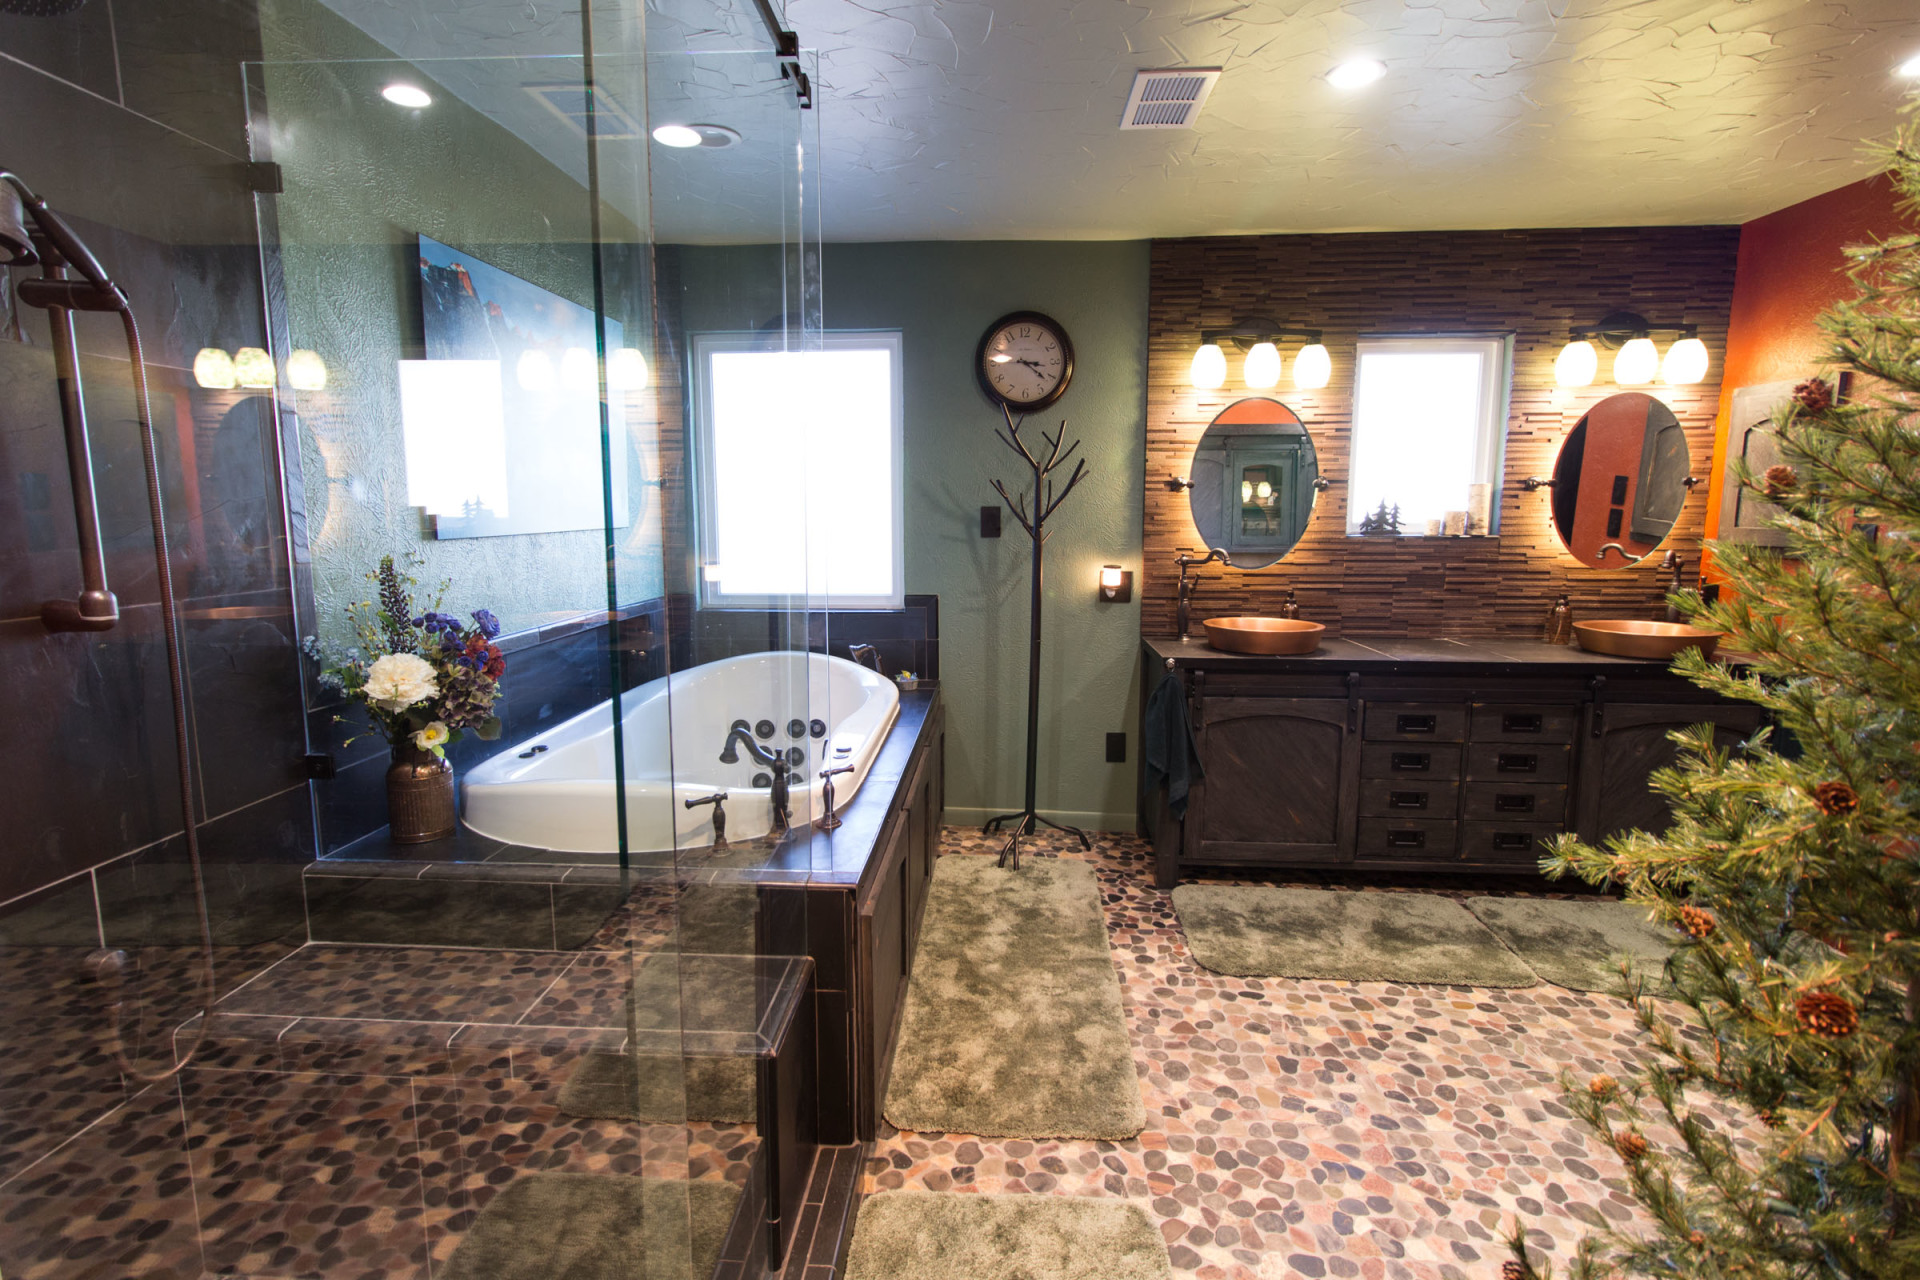 jarrell-signature-mountain-oasis-bathroom-remodel-8